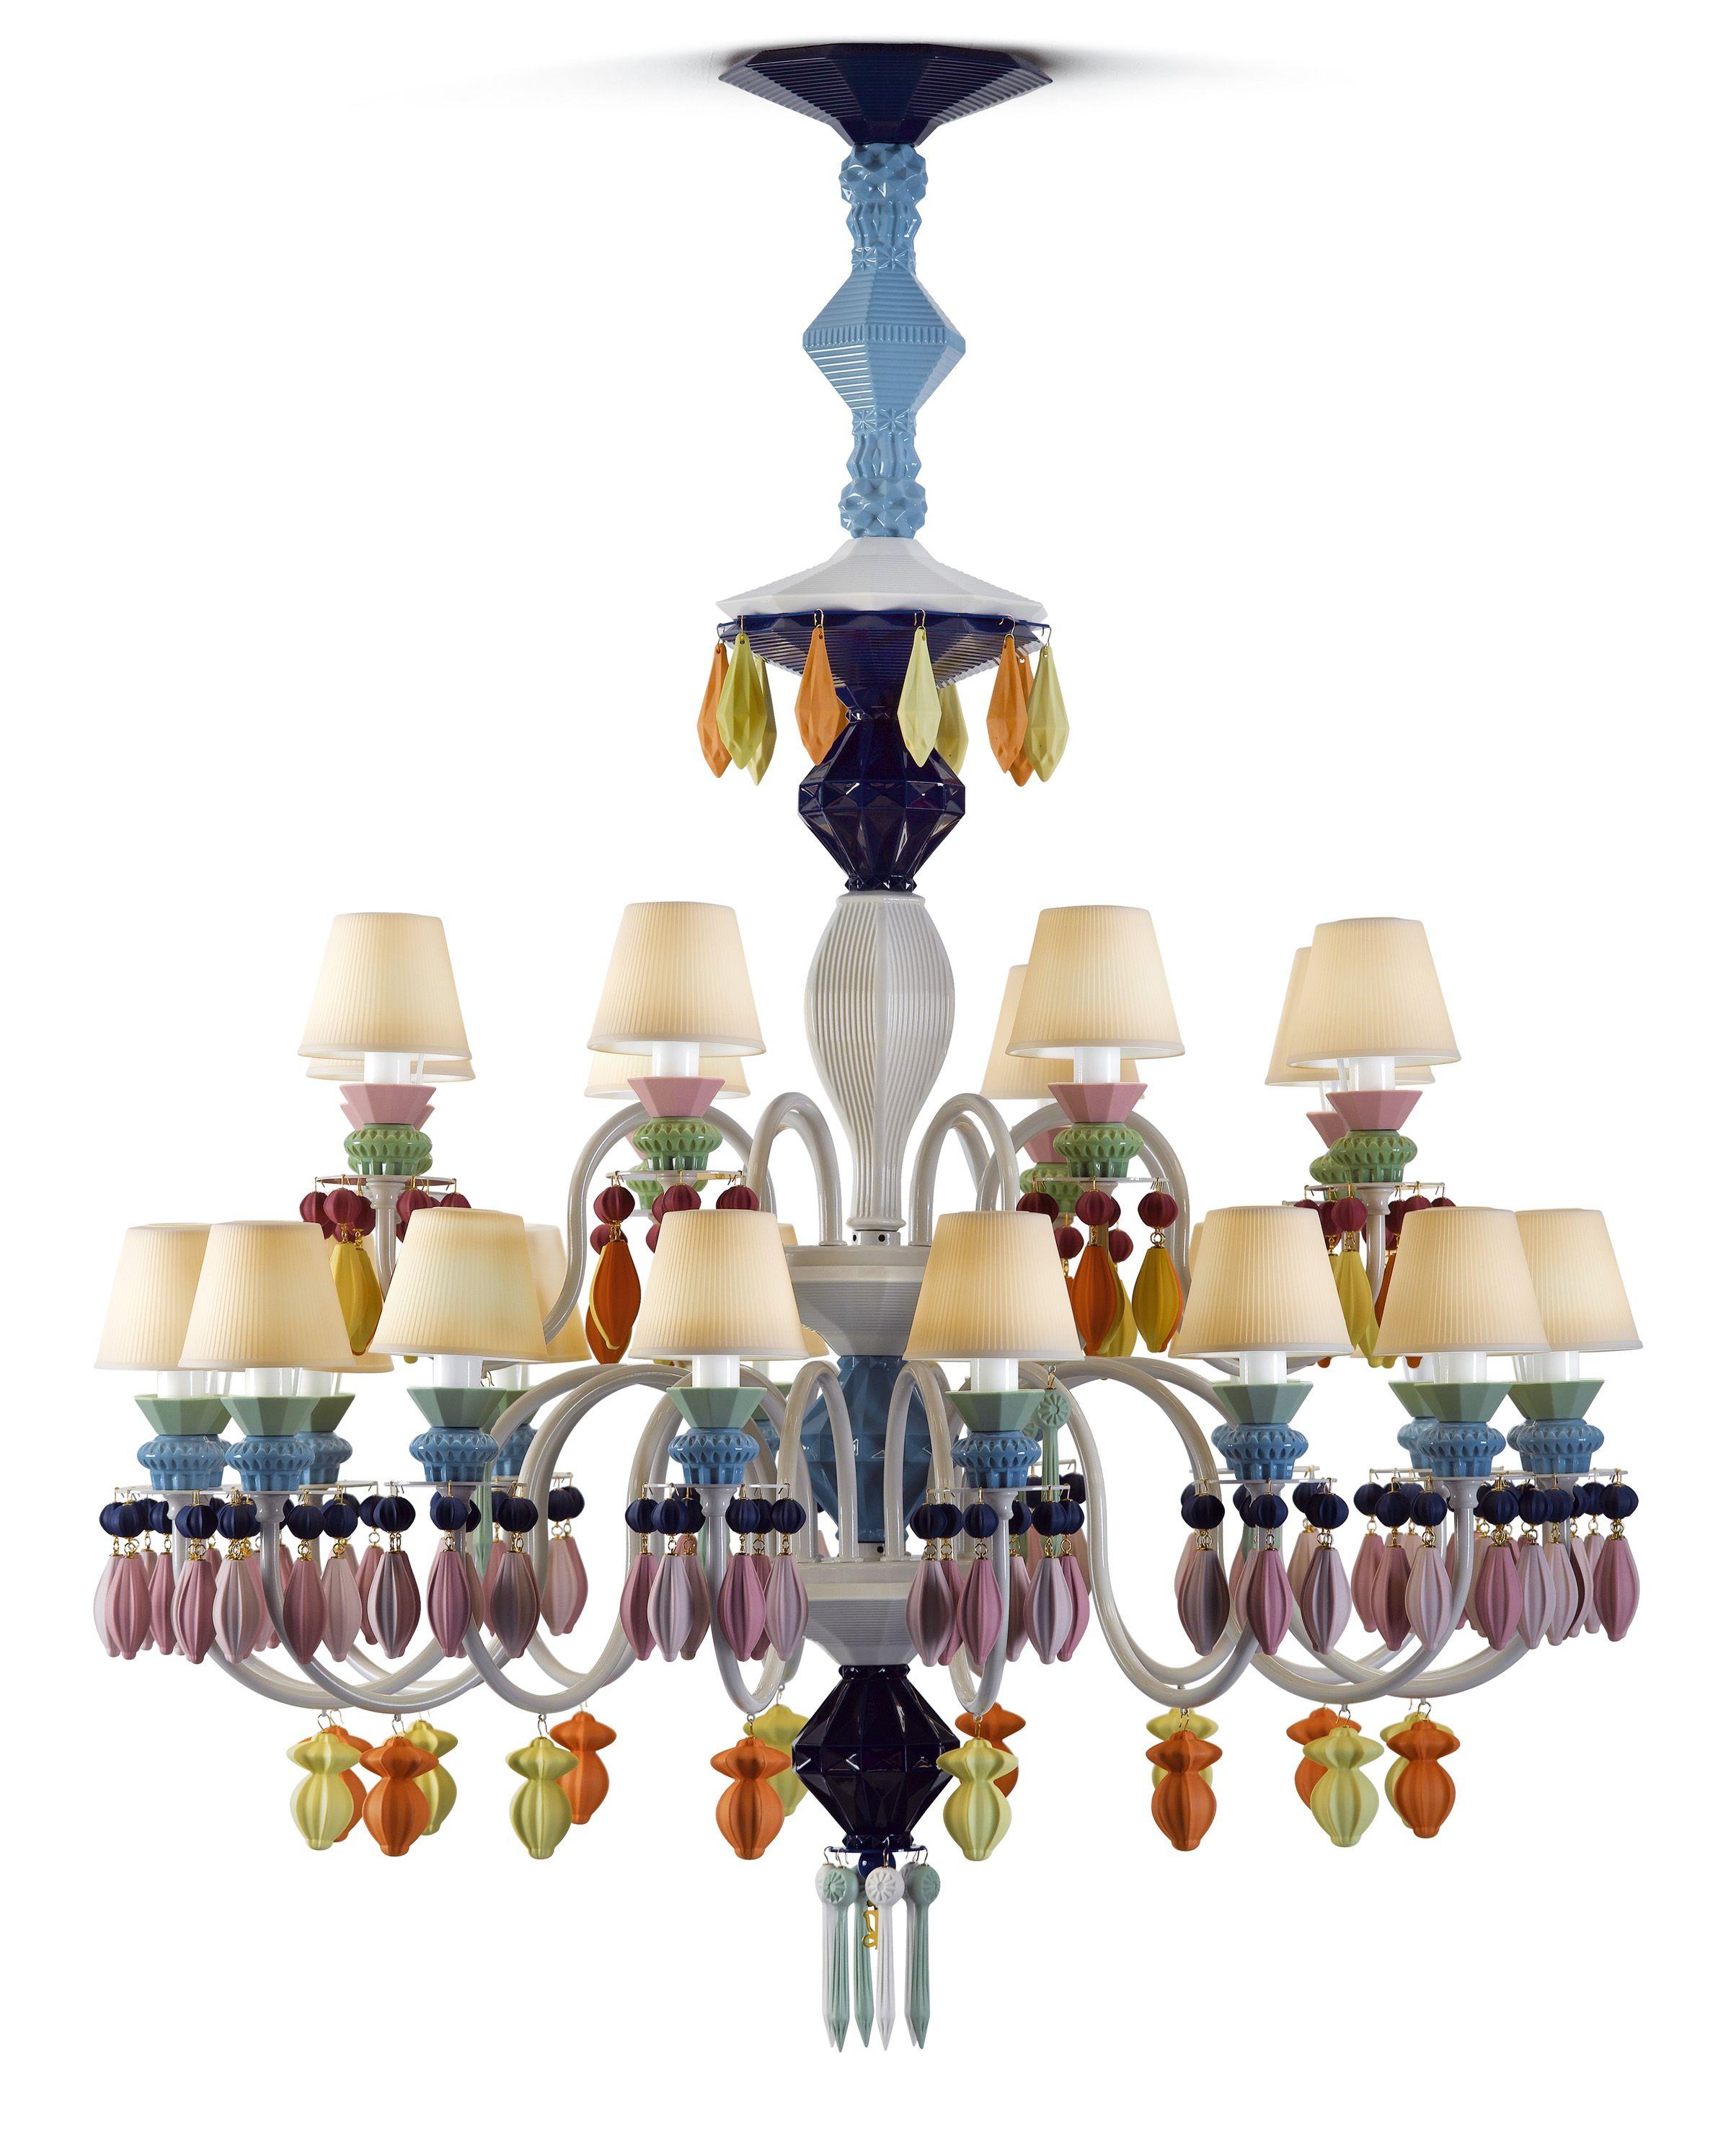 Lladr atelier belle de nuit porcelain chandelier multicolour lladro chandelier in multicolor chandelier entirely made in porcelain arubaitofo Gallery